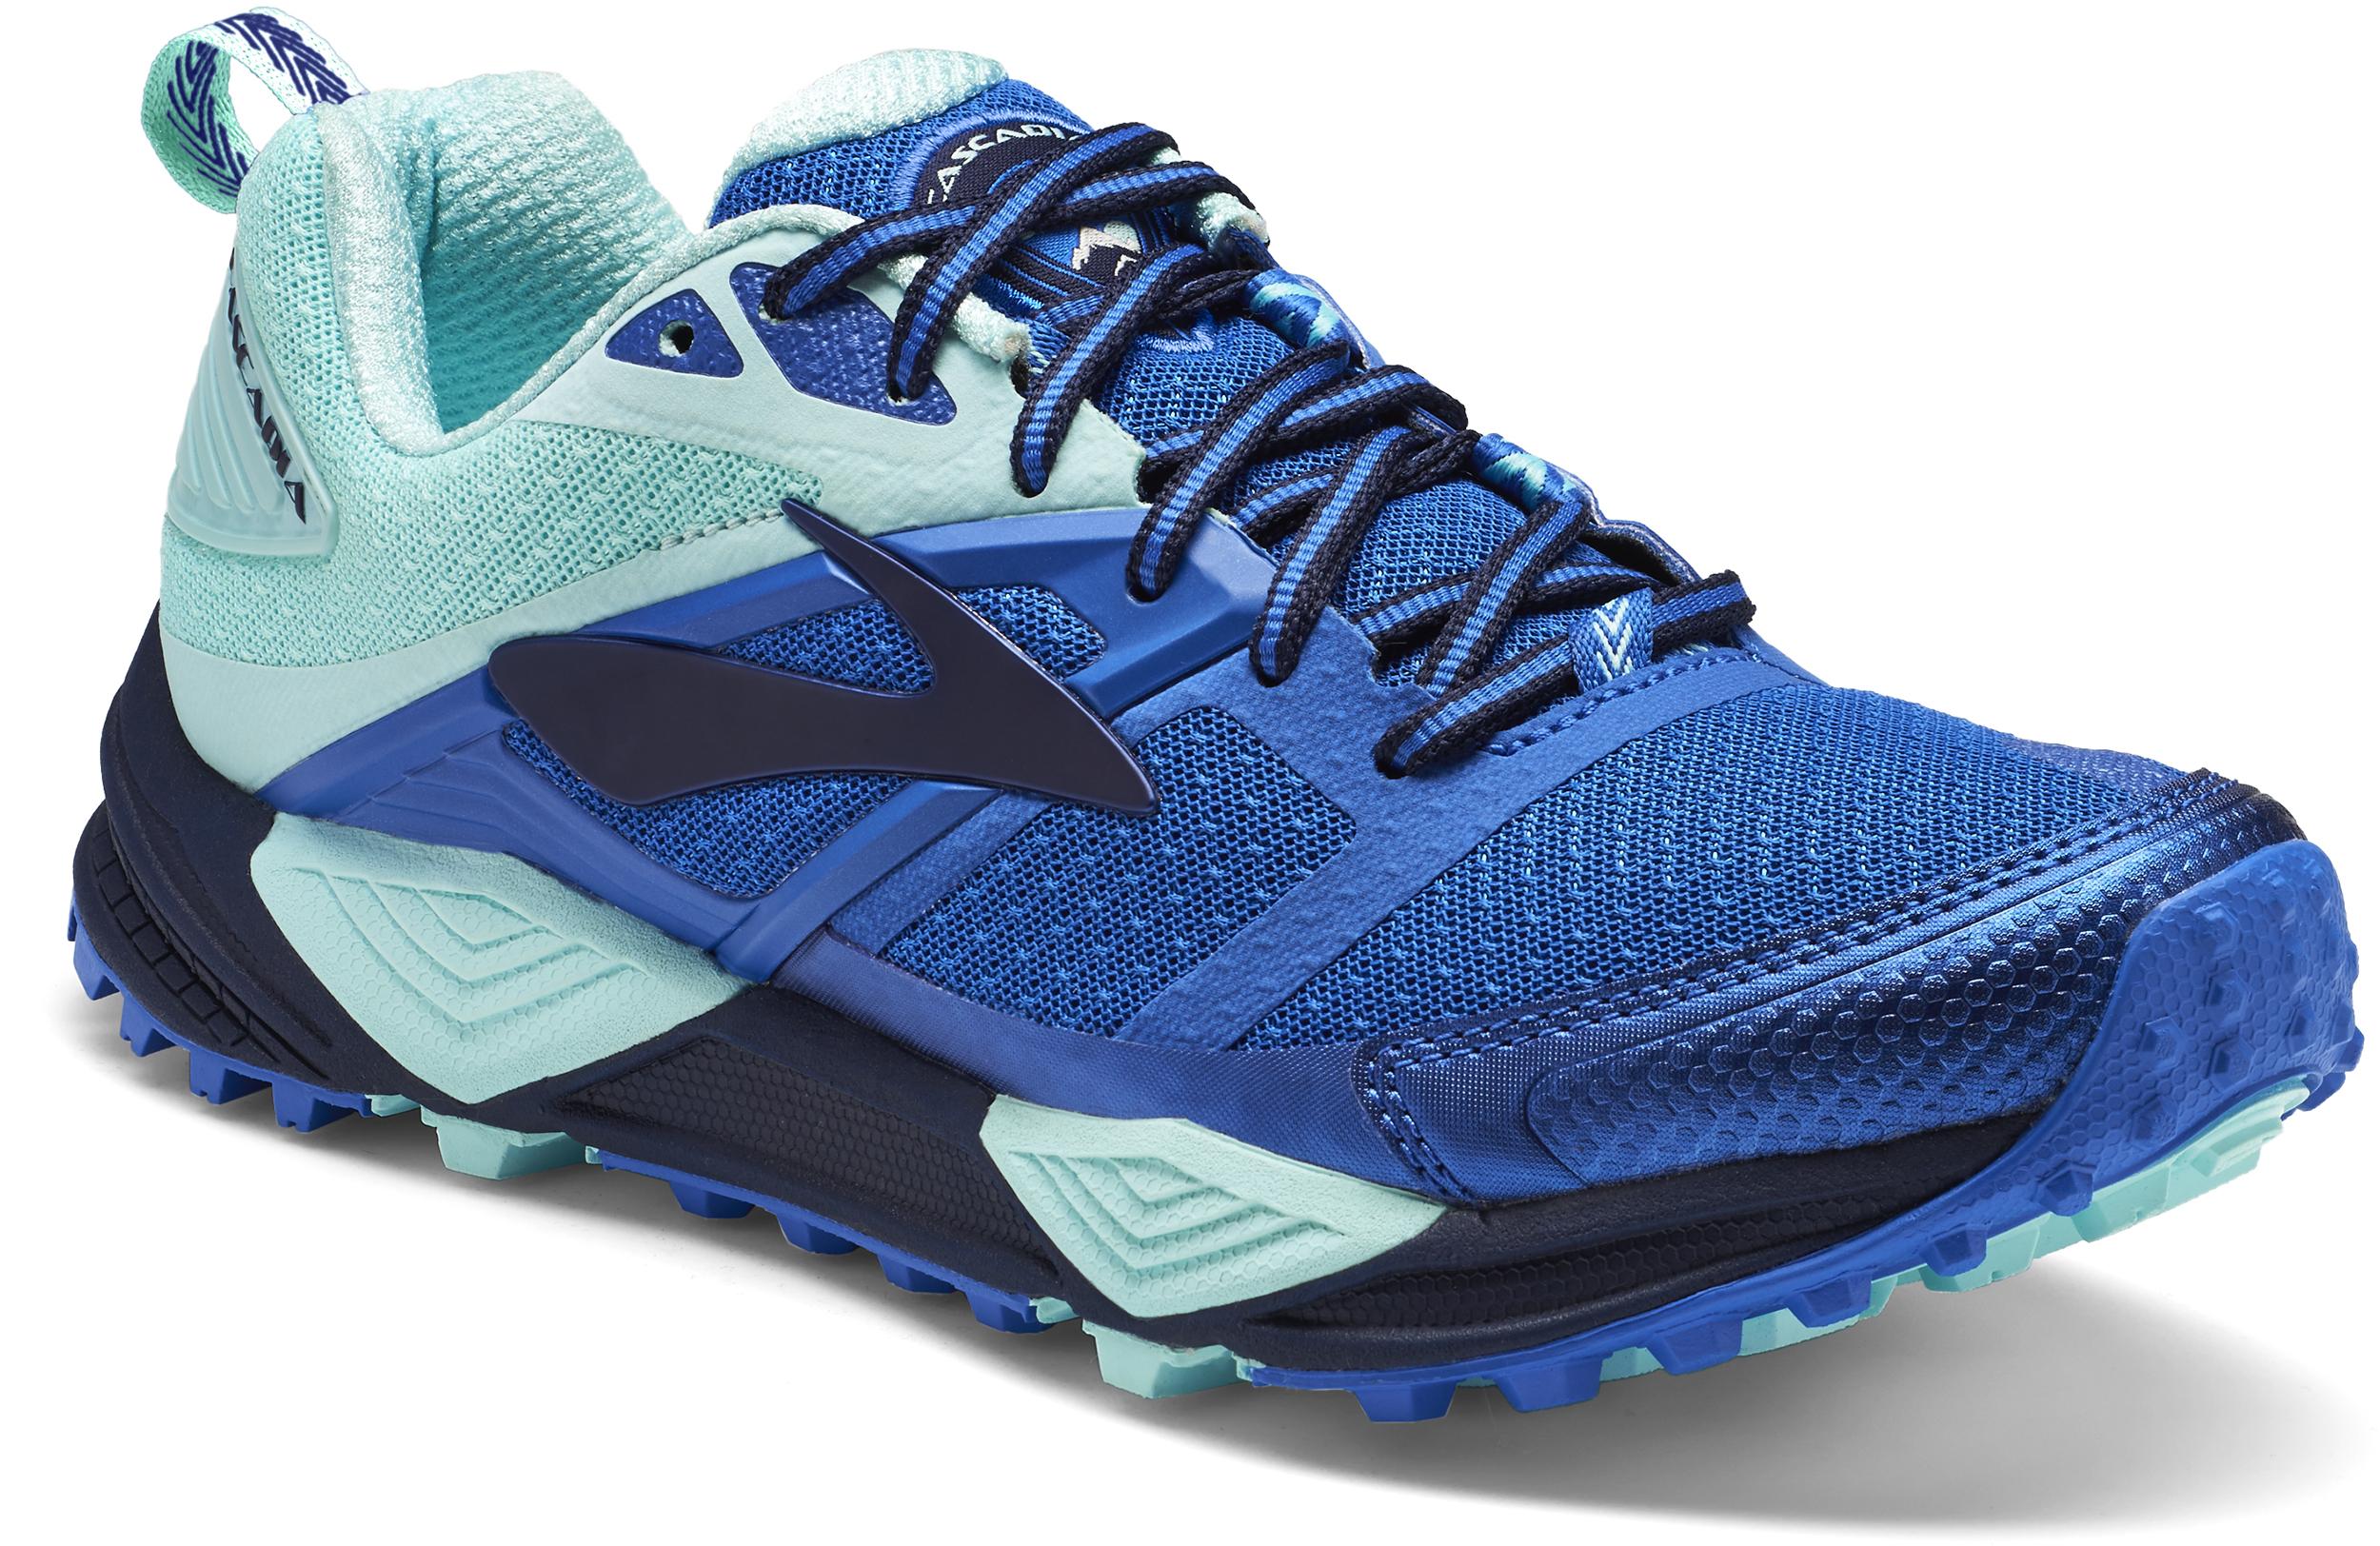 Brooks Cascadia 12 Trail Run Shoes